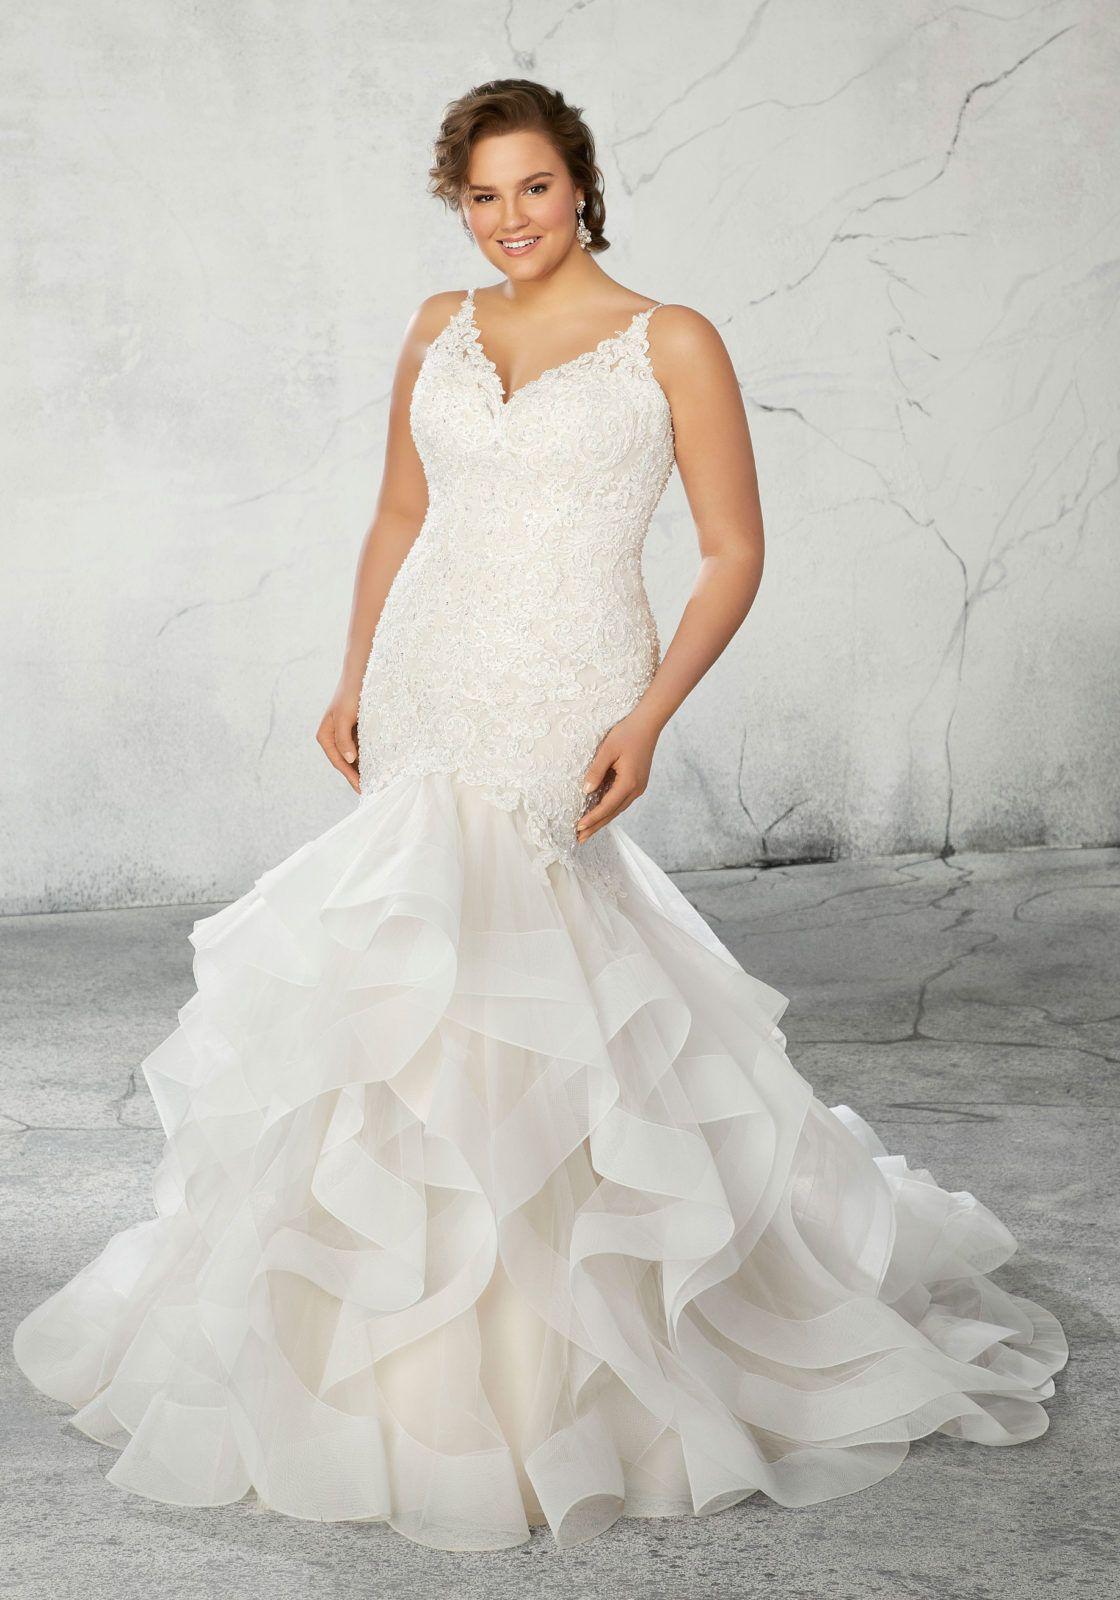 4acdd787b34b Raquel Wedding Dress Crystal Beaded Alençon Lace Appliqués and Straps Over Chantilly  Lace Body with Horsehair Edged, Flounced Tulle Mermaid Skirt.